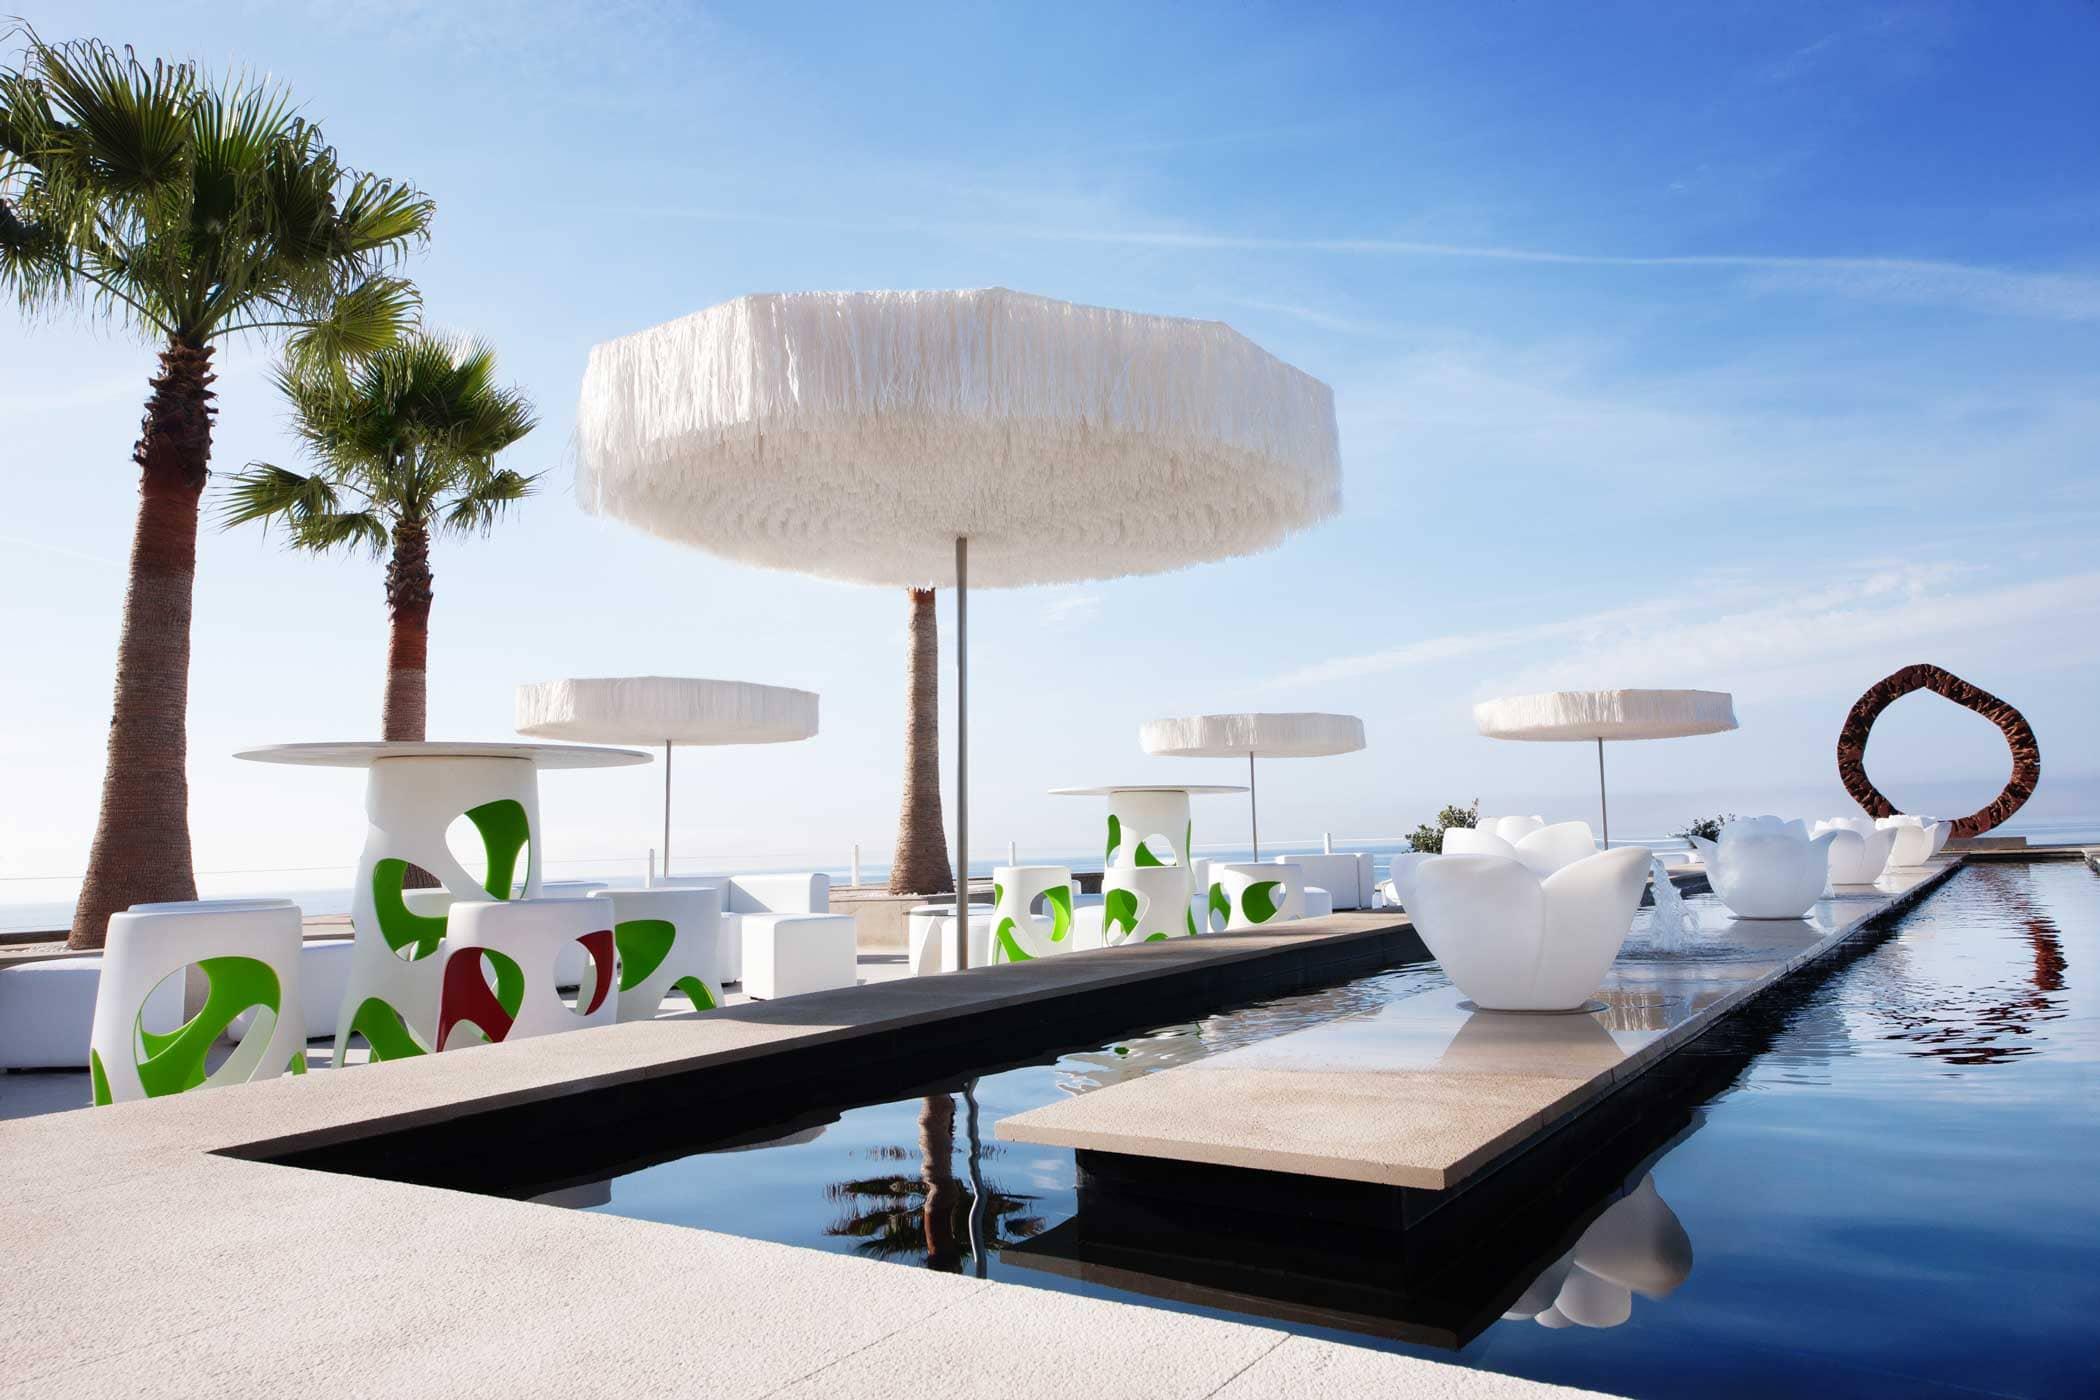 Anima Beach Club para bodas y eventos en la bahía de Palma de Mallorca